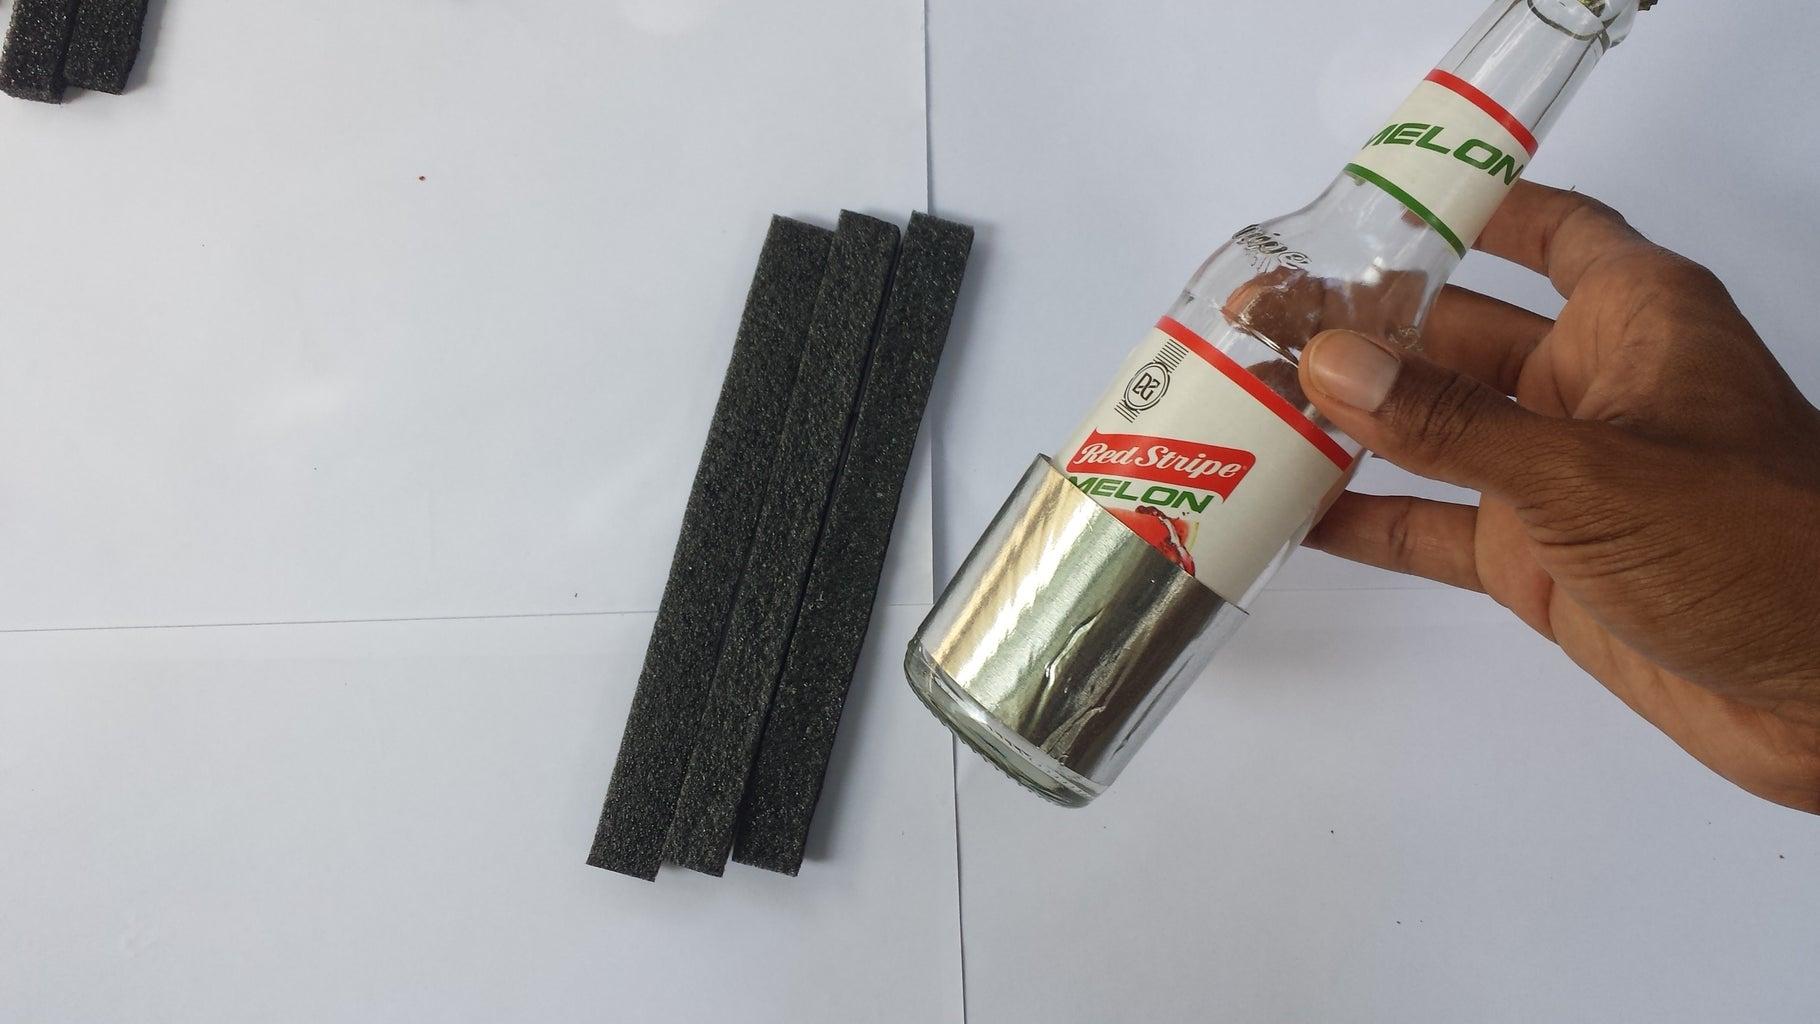 Sticking Foam to Foil Tape